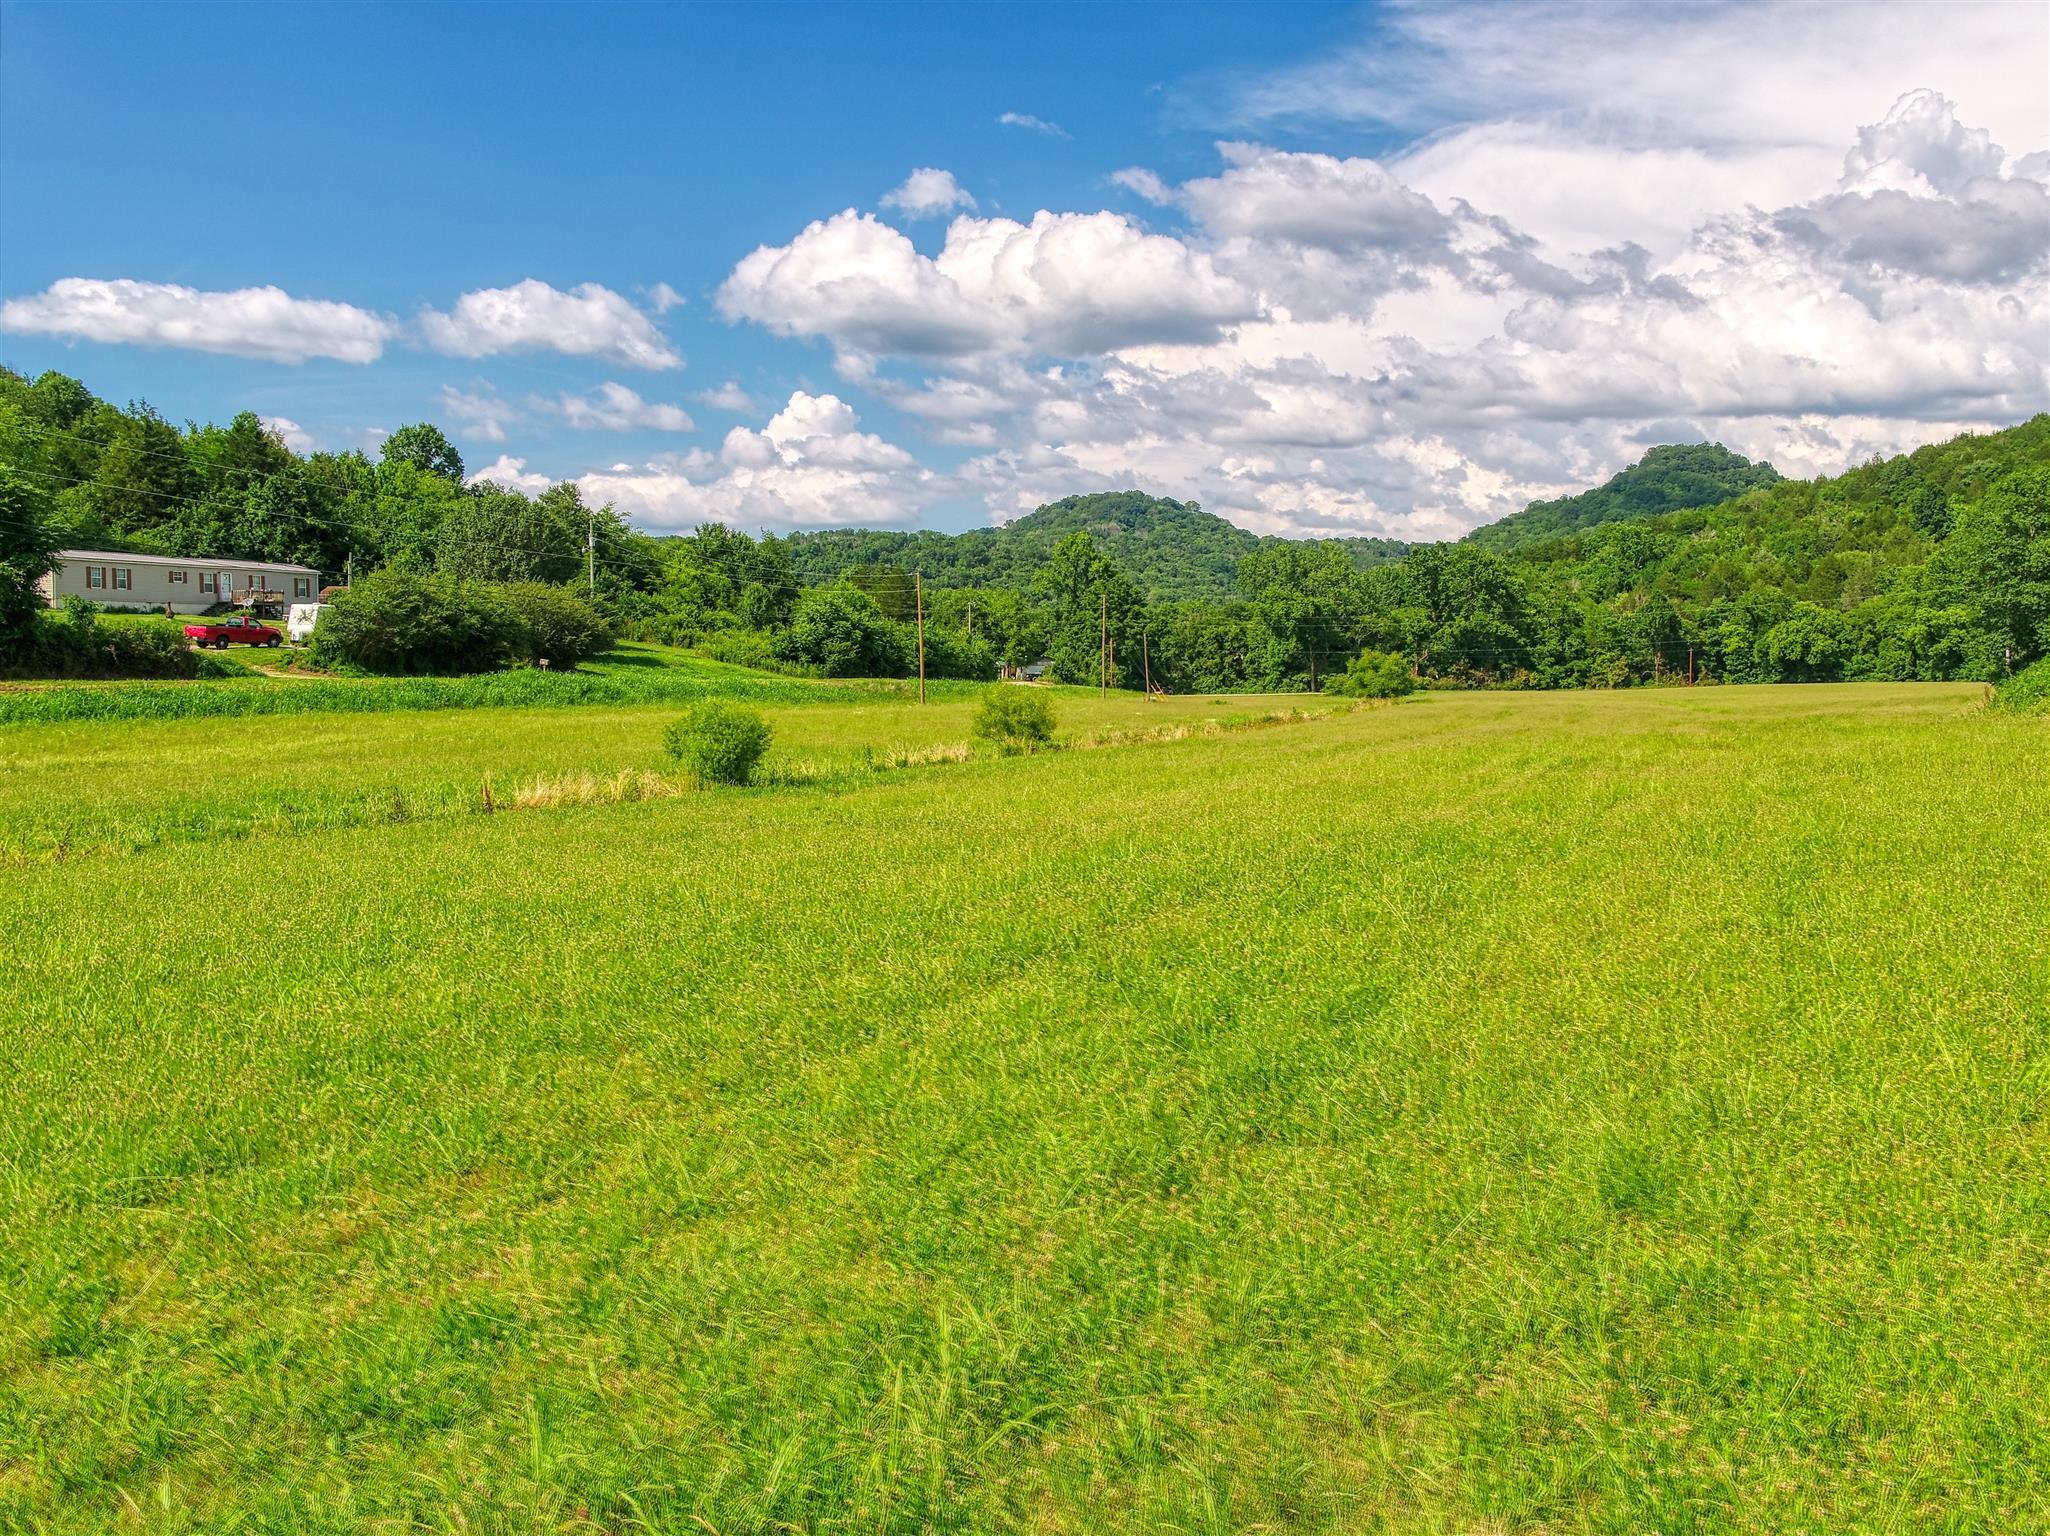 7 Enigma Road, Chestnut Mound, TN 38552 - Chestnut Mound, TN real estate listing